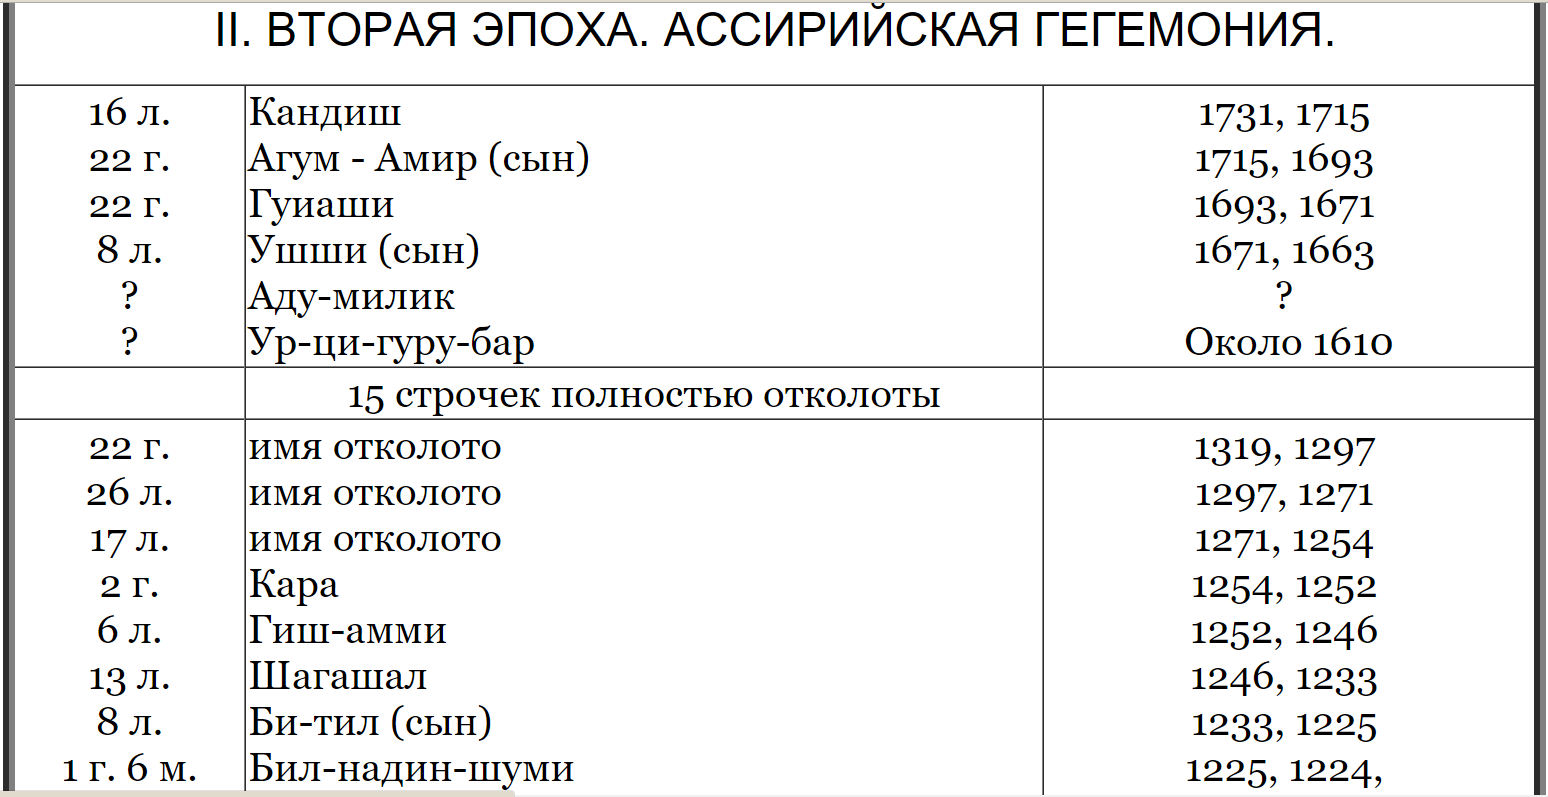 http://s7.uploads.ru/03Uzb.png